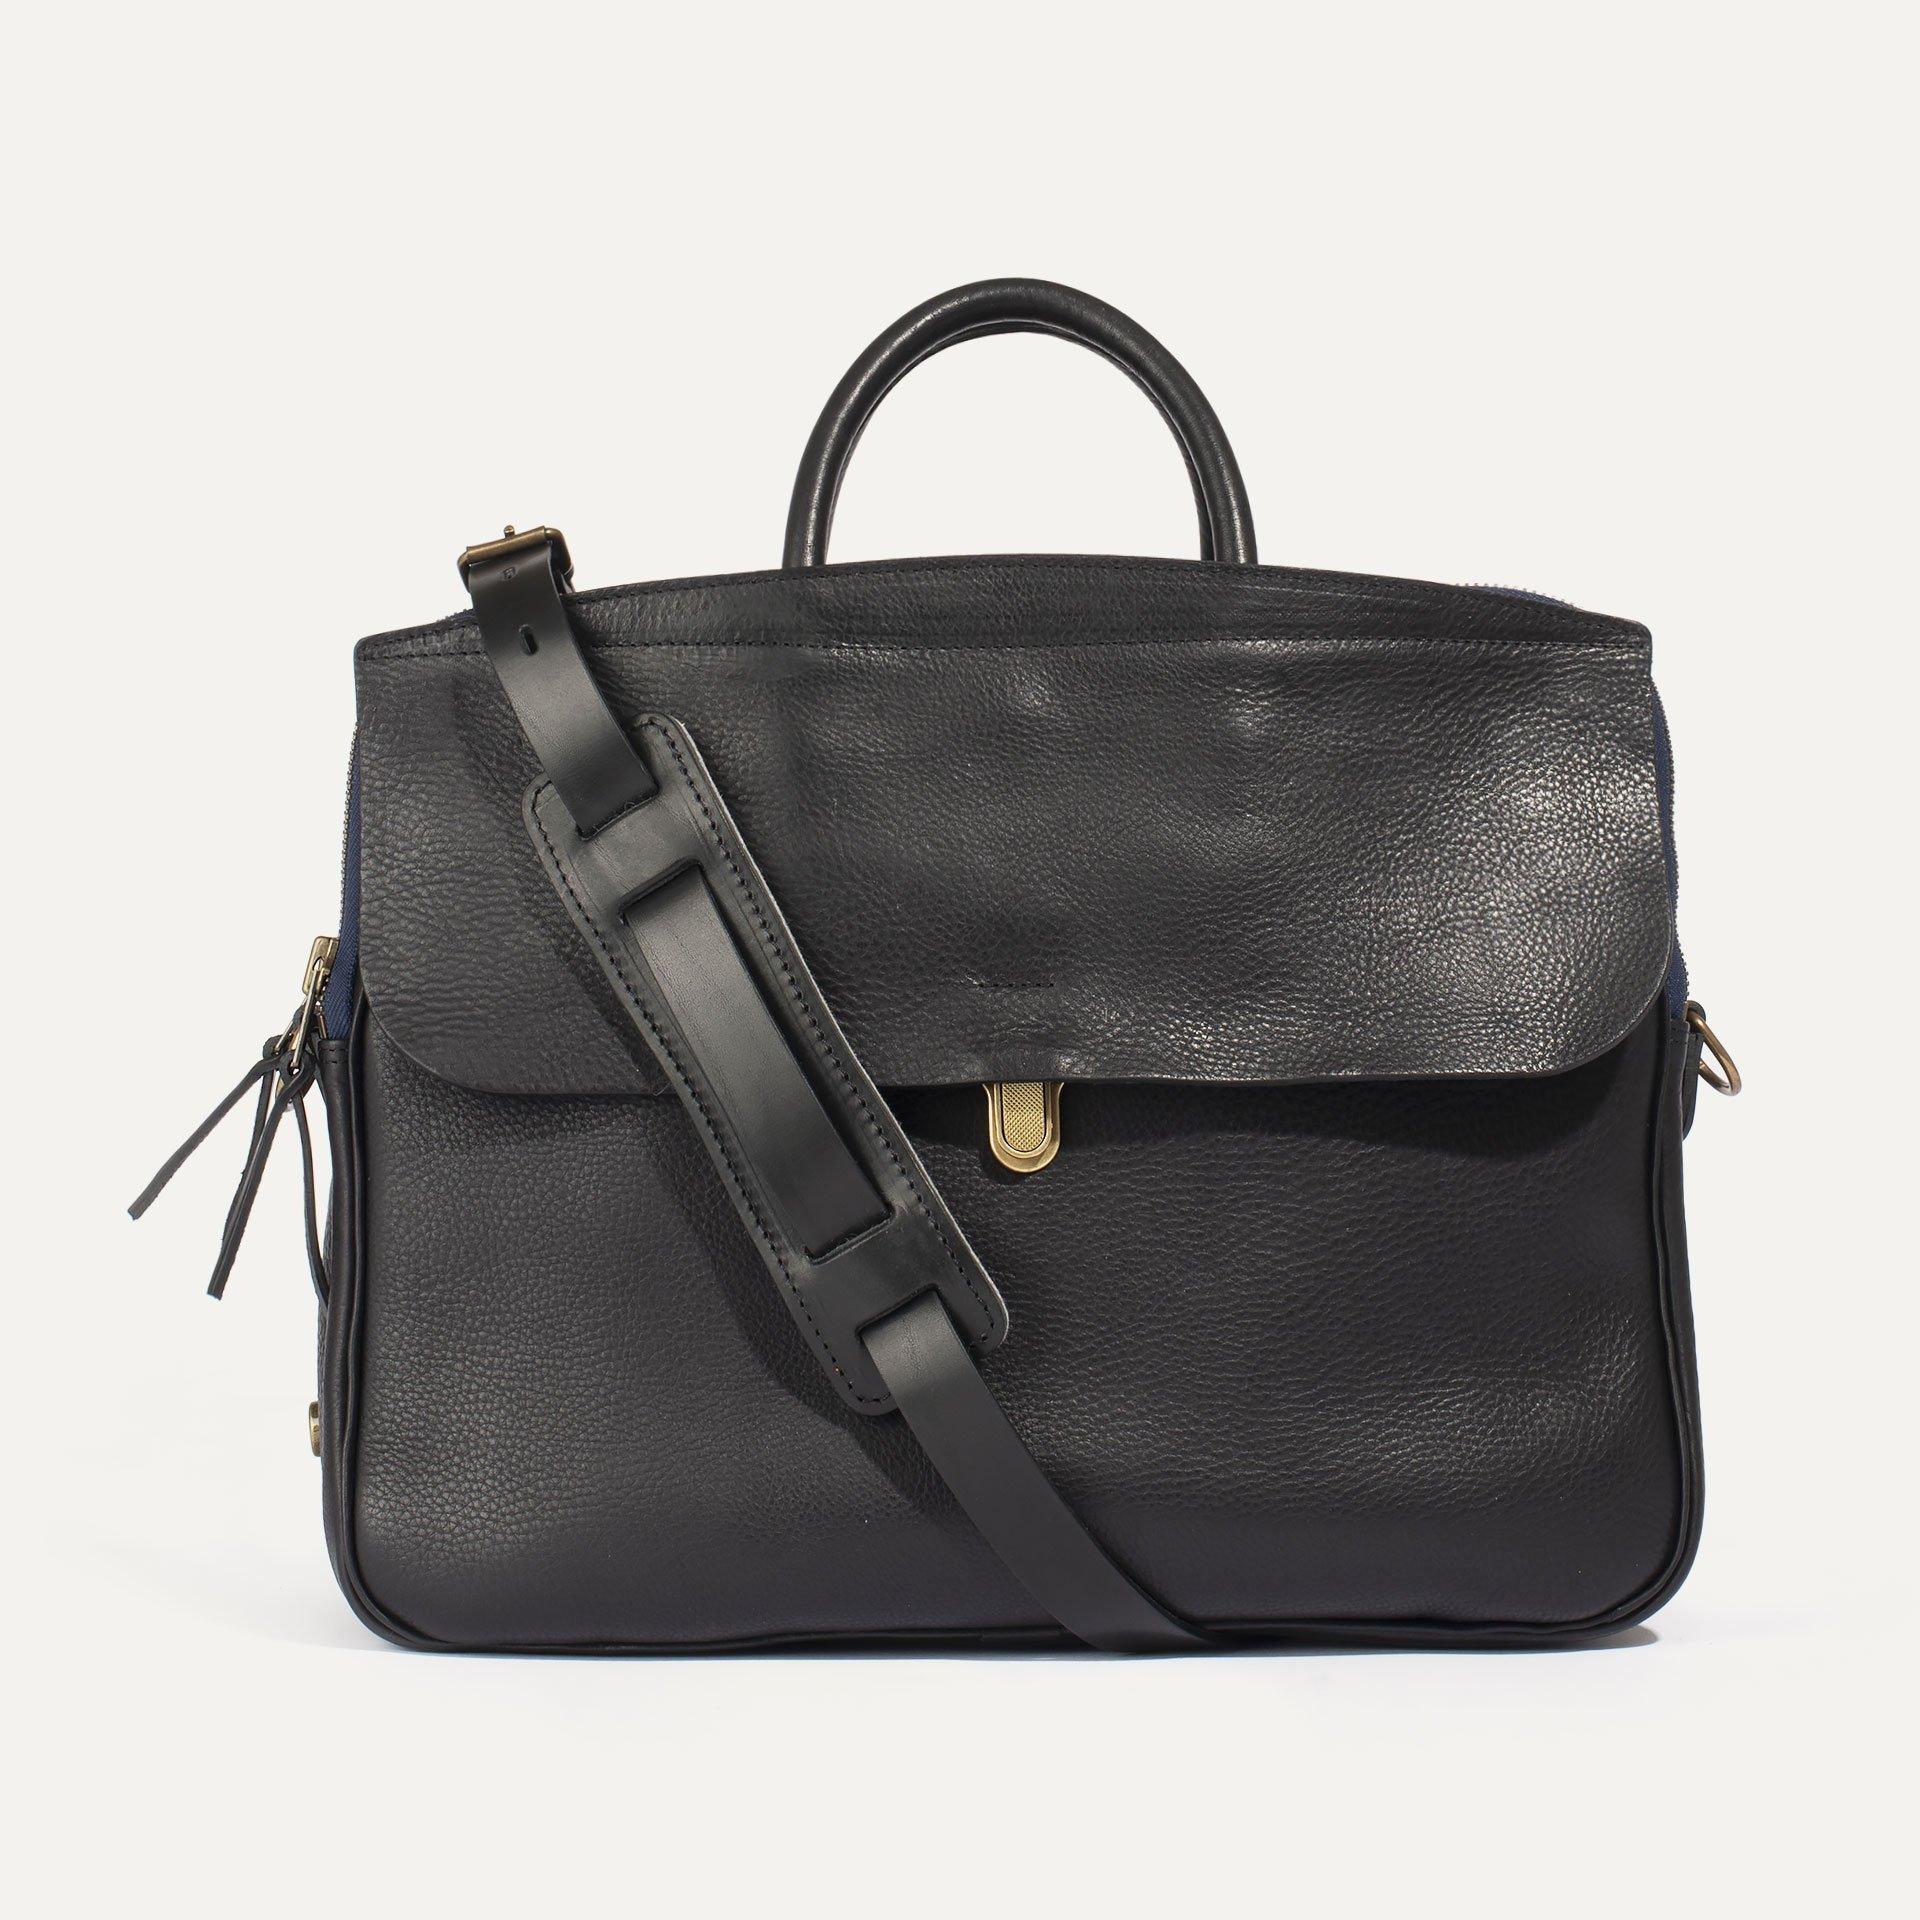 Zeppo Business bag - Black / E Pure (image n°1)